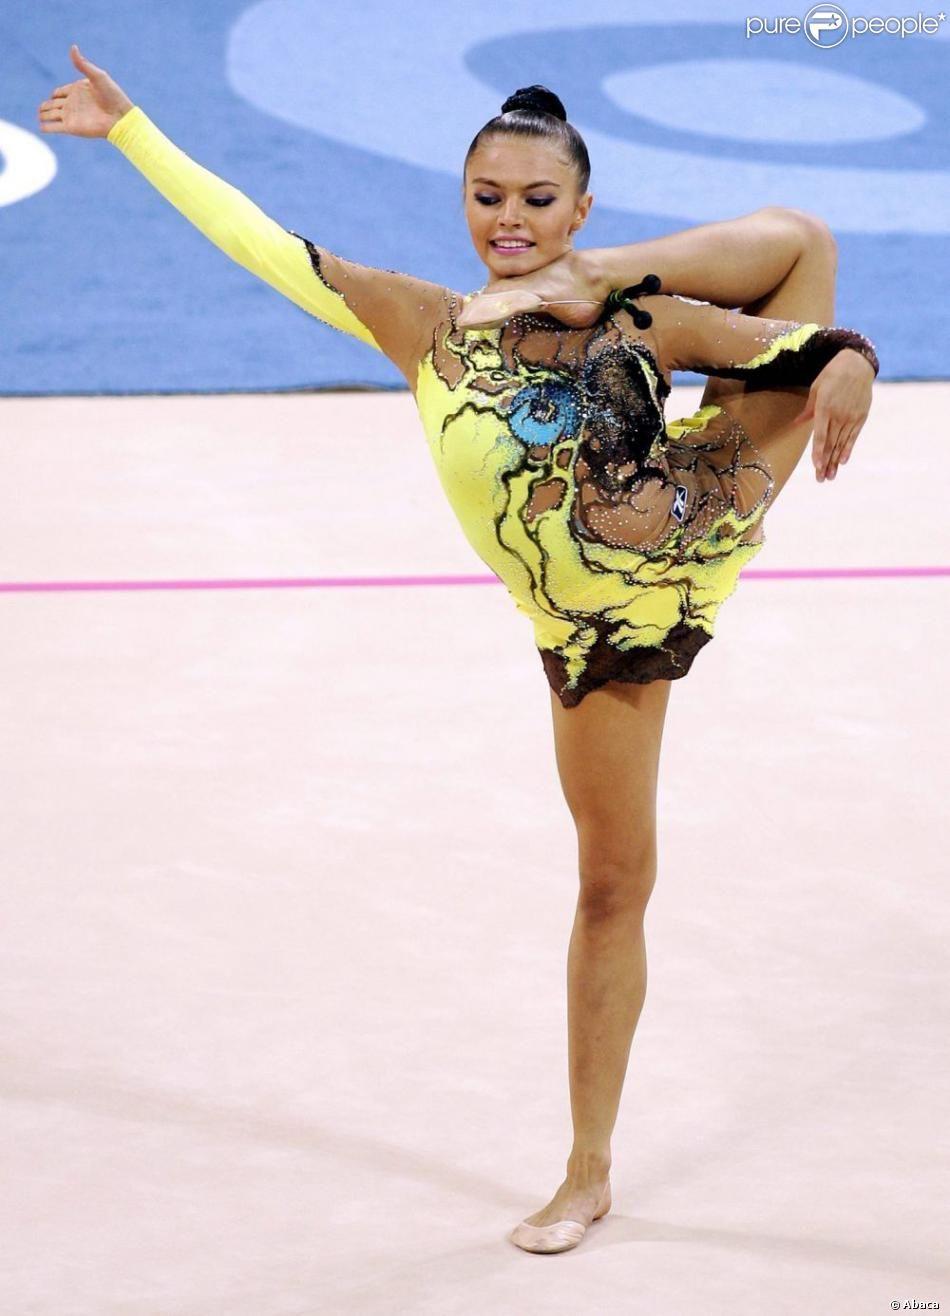 Alina Kabaeva (Russia), Athens 2004, Clubs, Rhythmic ... Alina Kabaeva Gymnastics